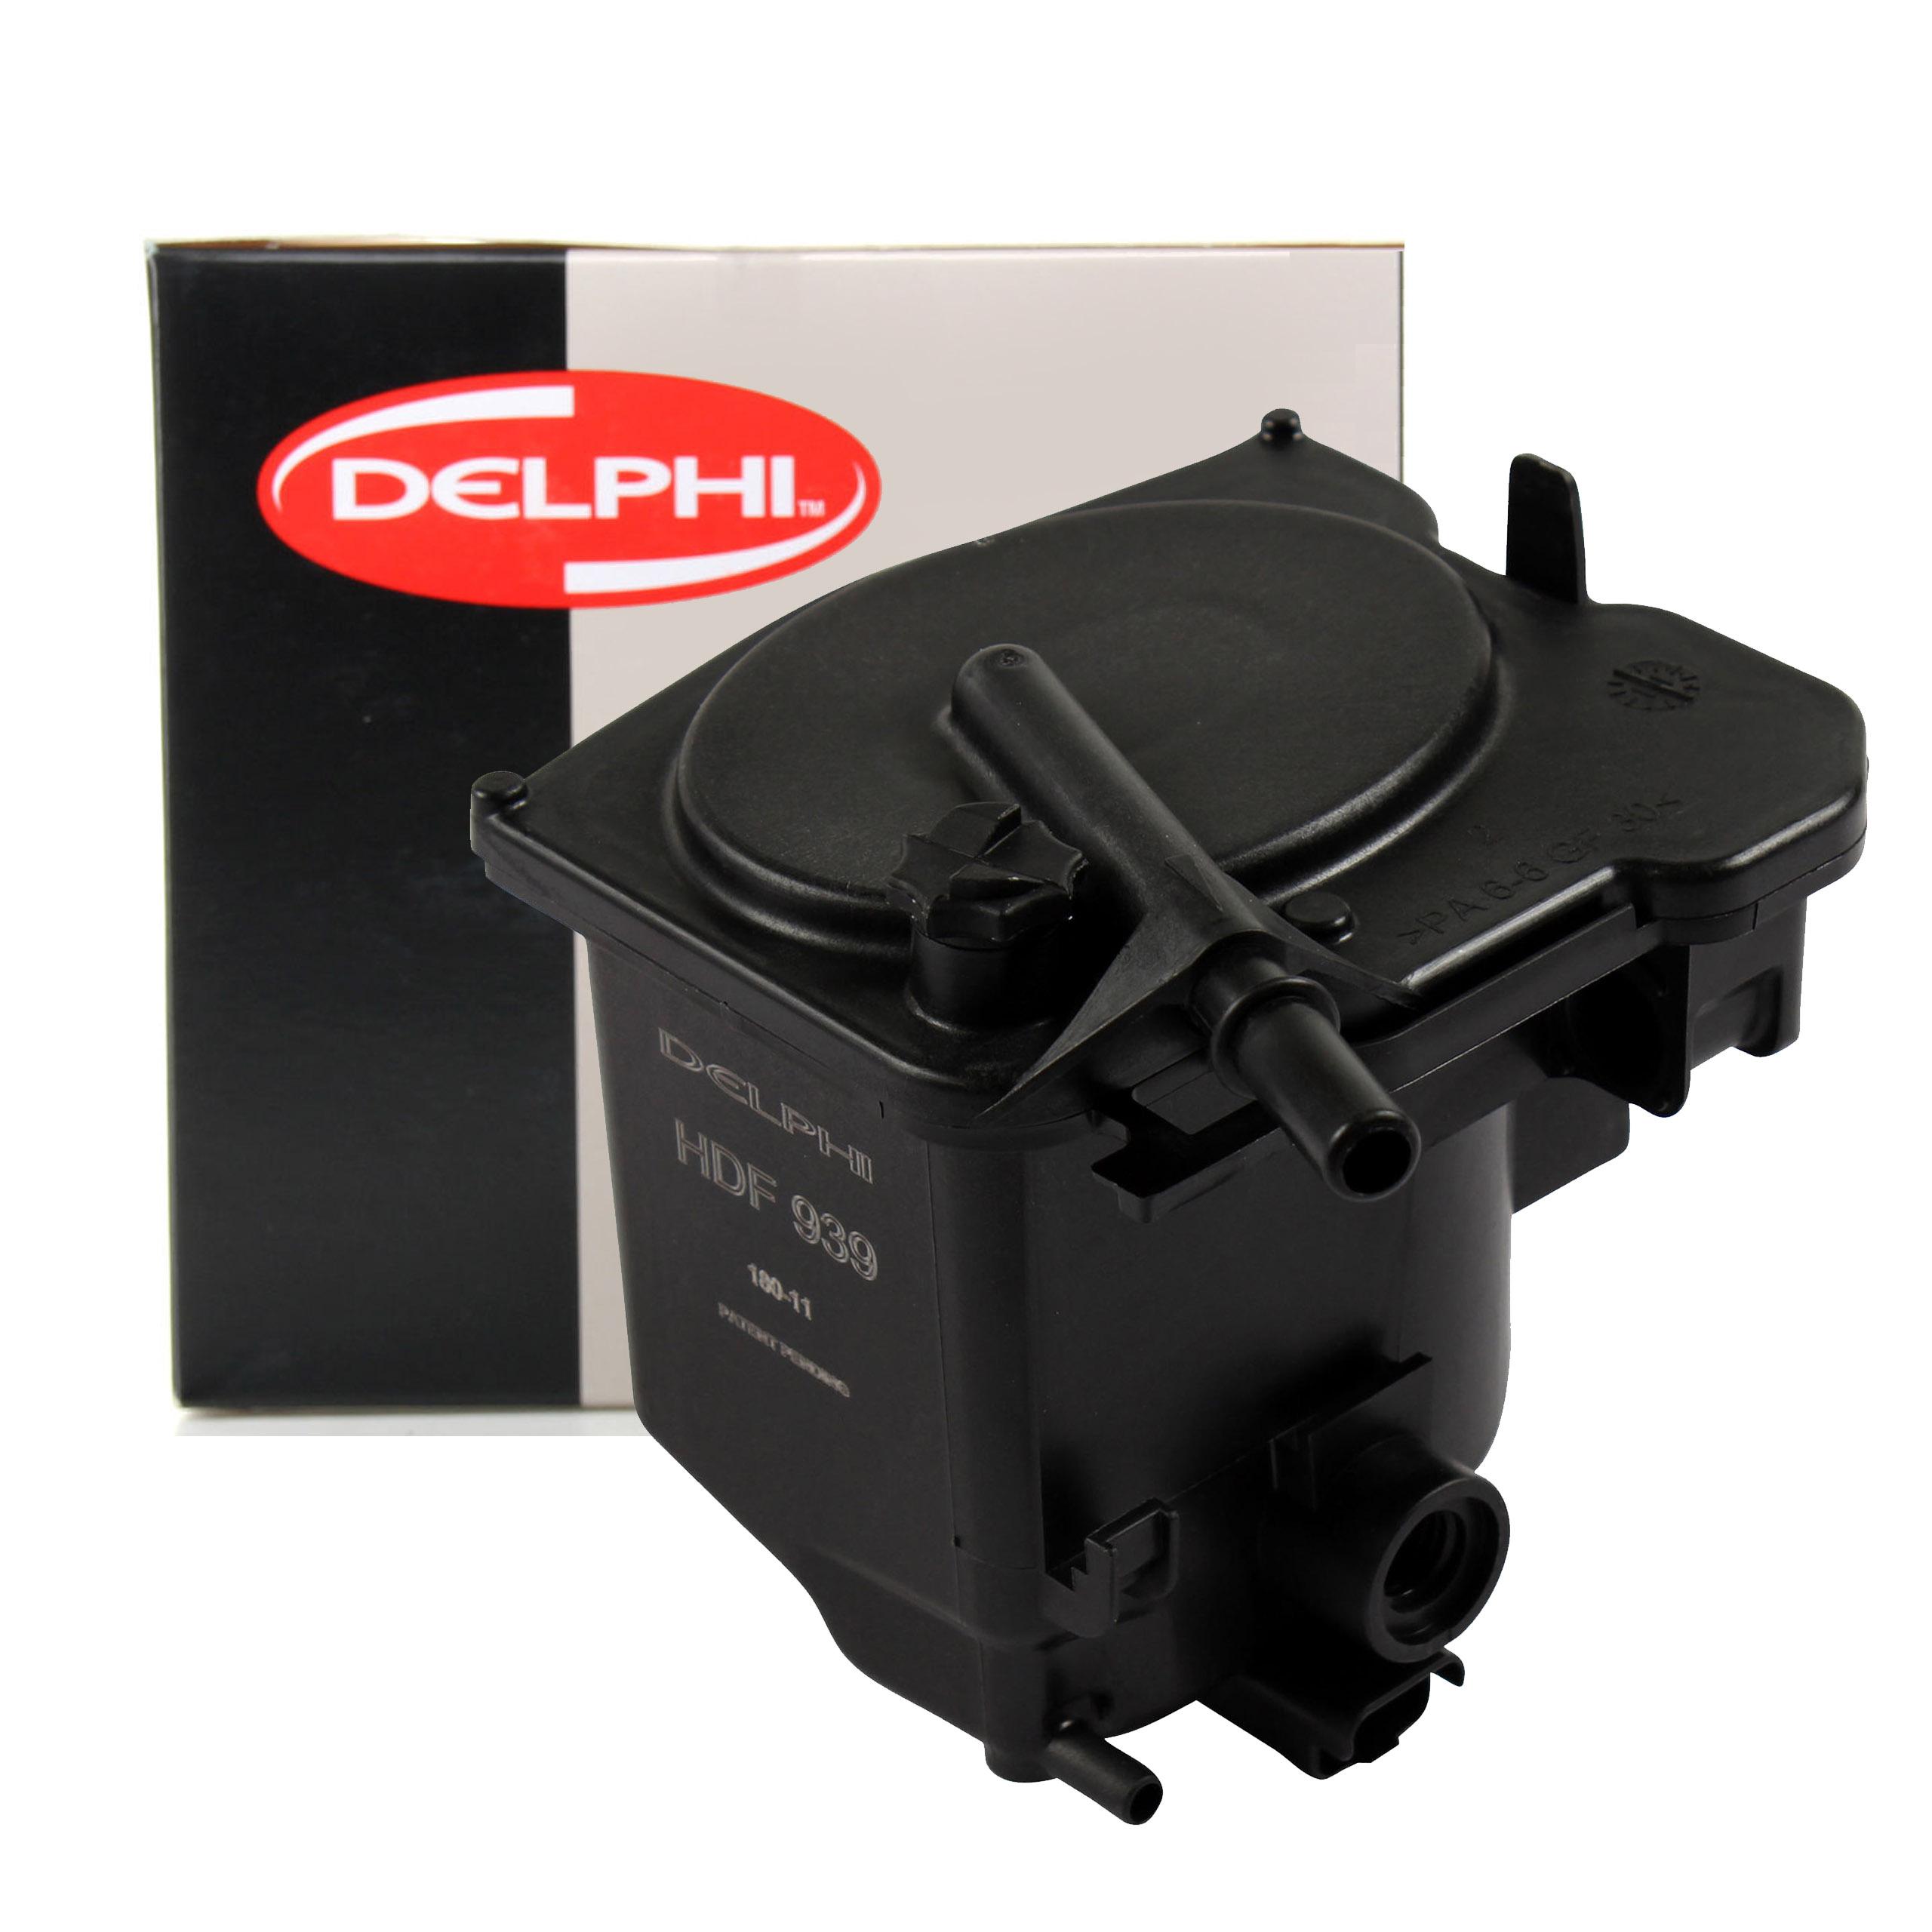 фильтр топлива delphi citroen c4 пикассо 16 hdi